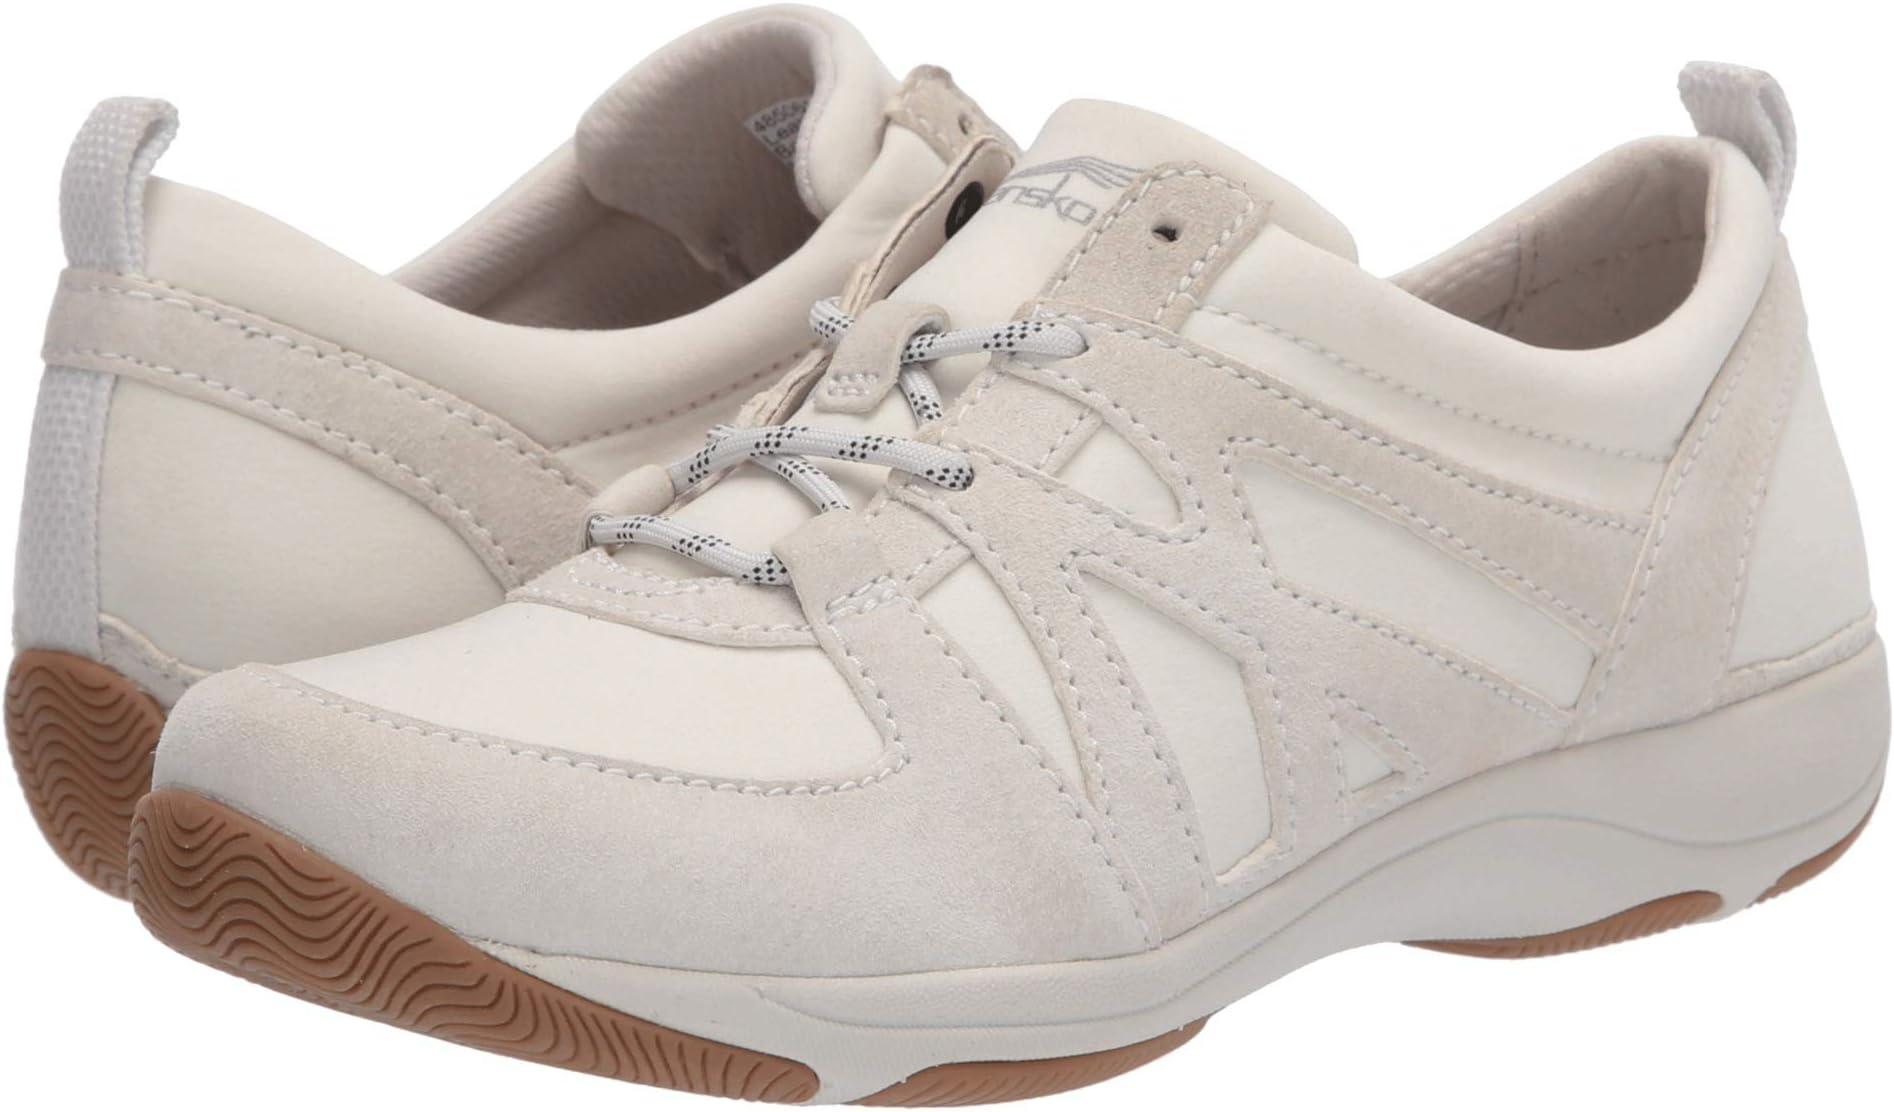 Dansko Sneakers